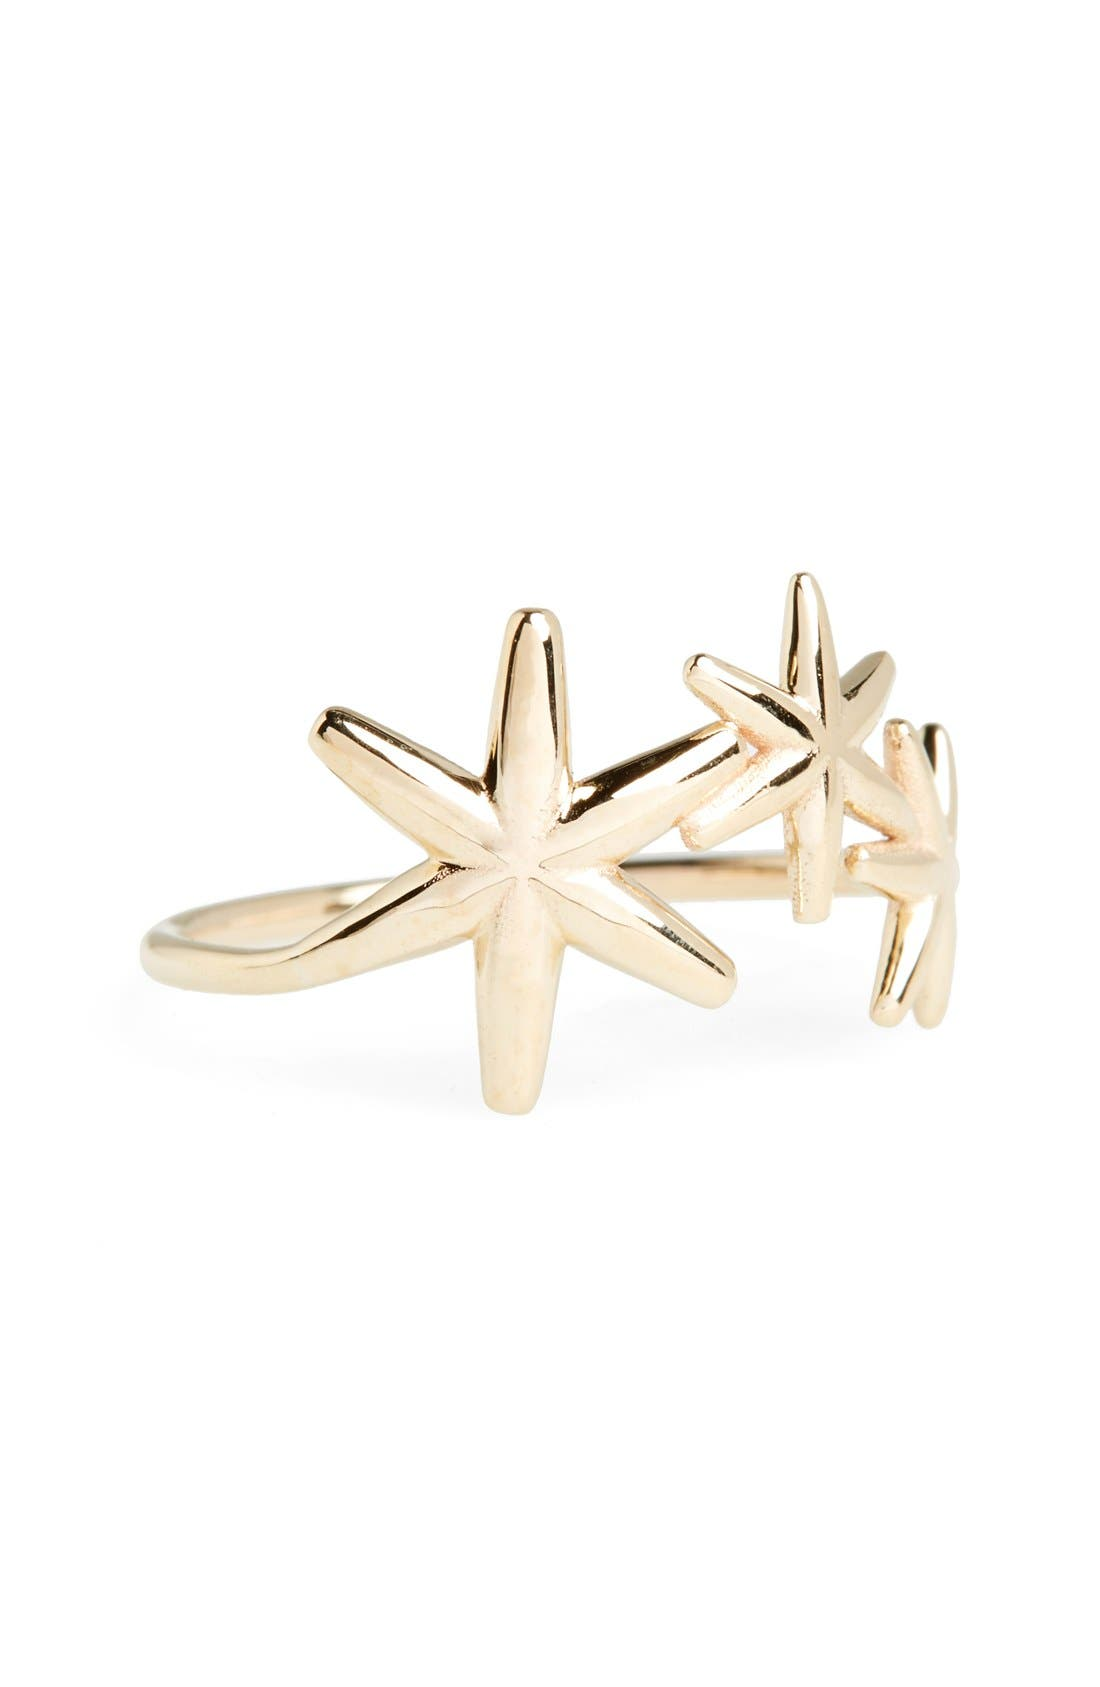 SARAH & SEBASTIAN 'Nimbus' Star Ring